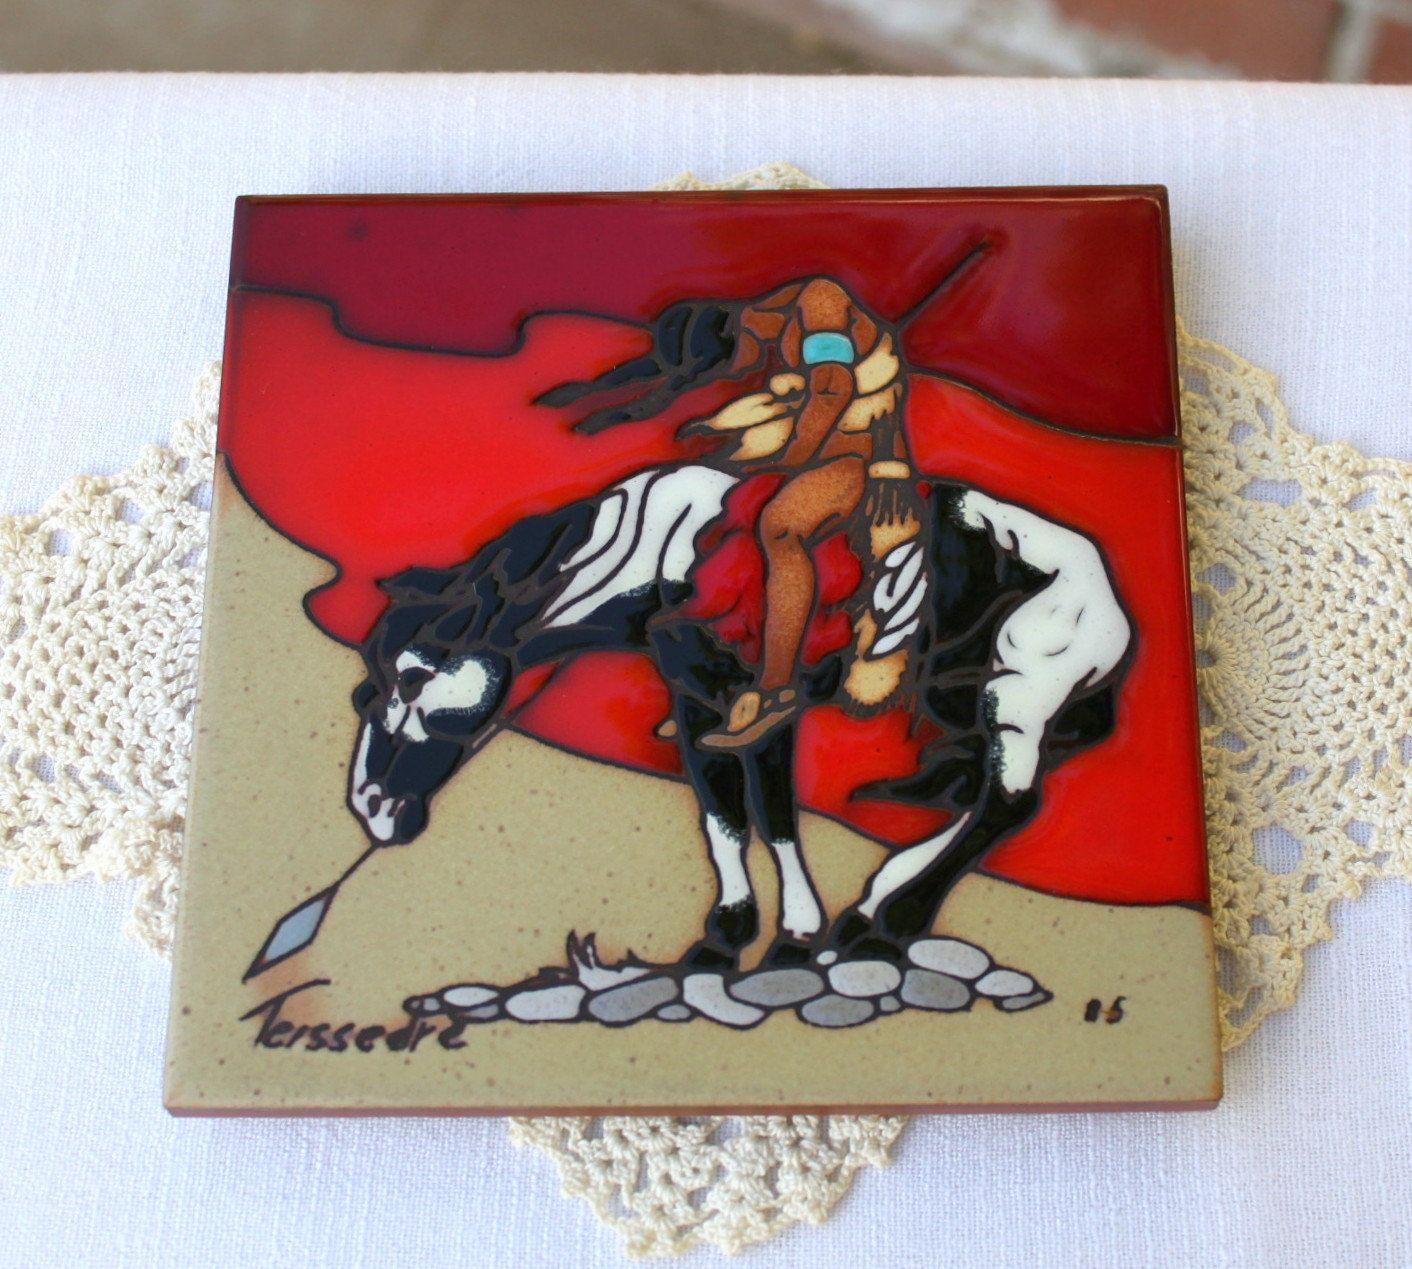 Vintage Southwestern Rustic Decor Native American Navajo Fine Ceramic Art  Signed, Navajo Pottery Art Kitchen Decor Trivet Or Wall Hanging